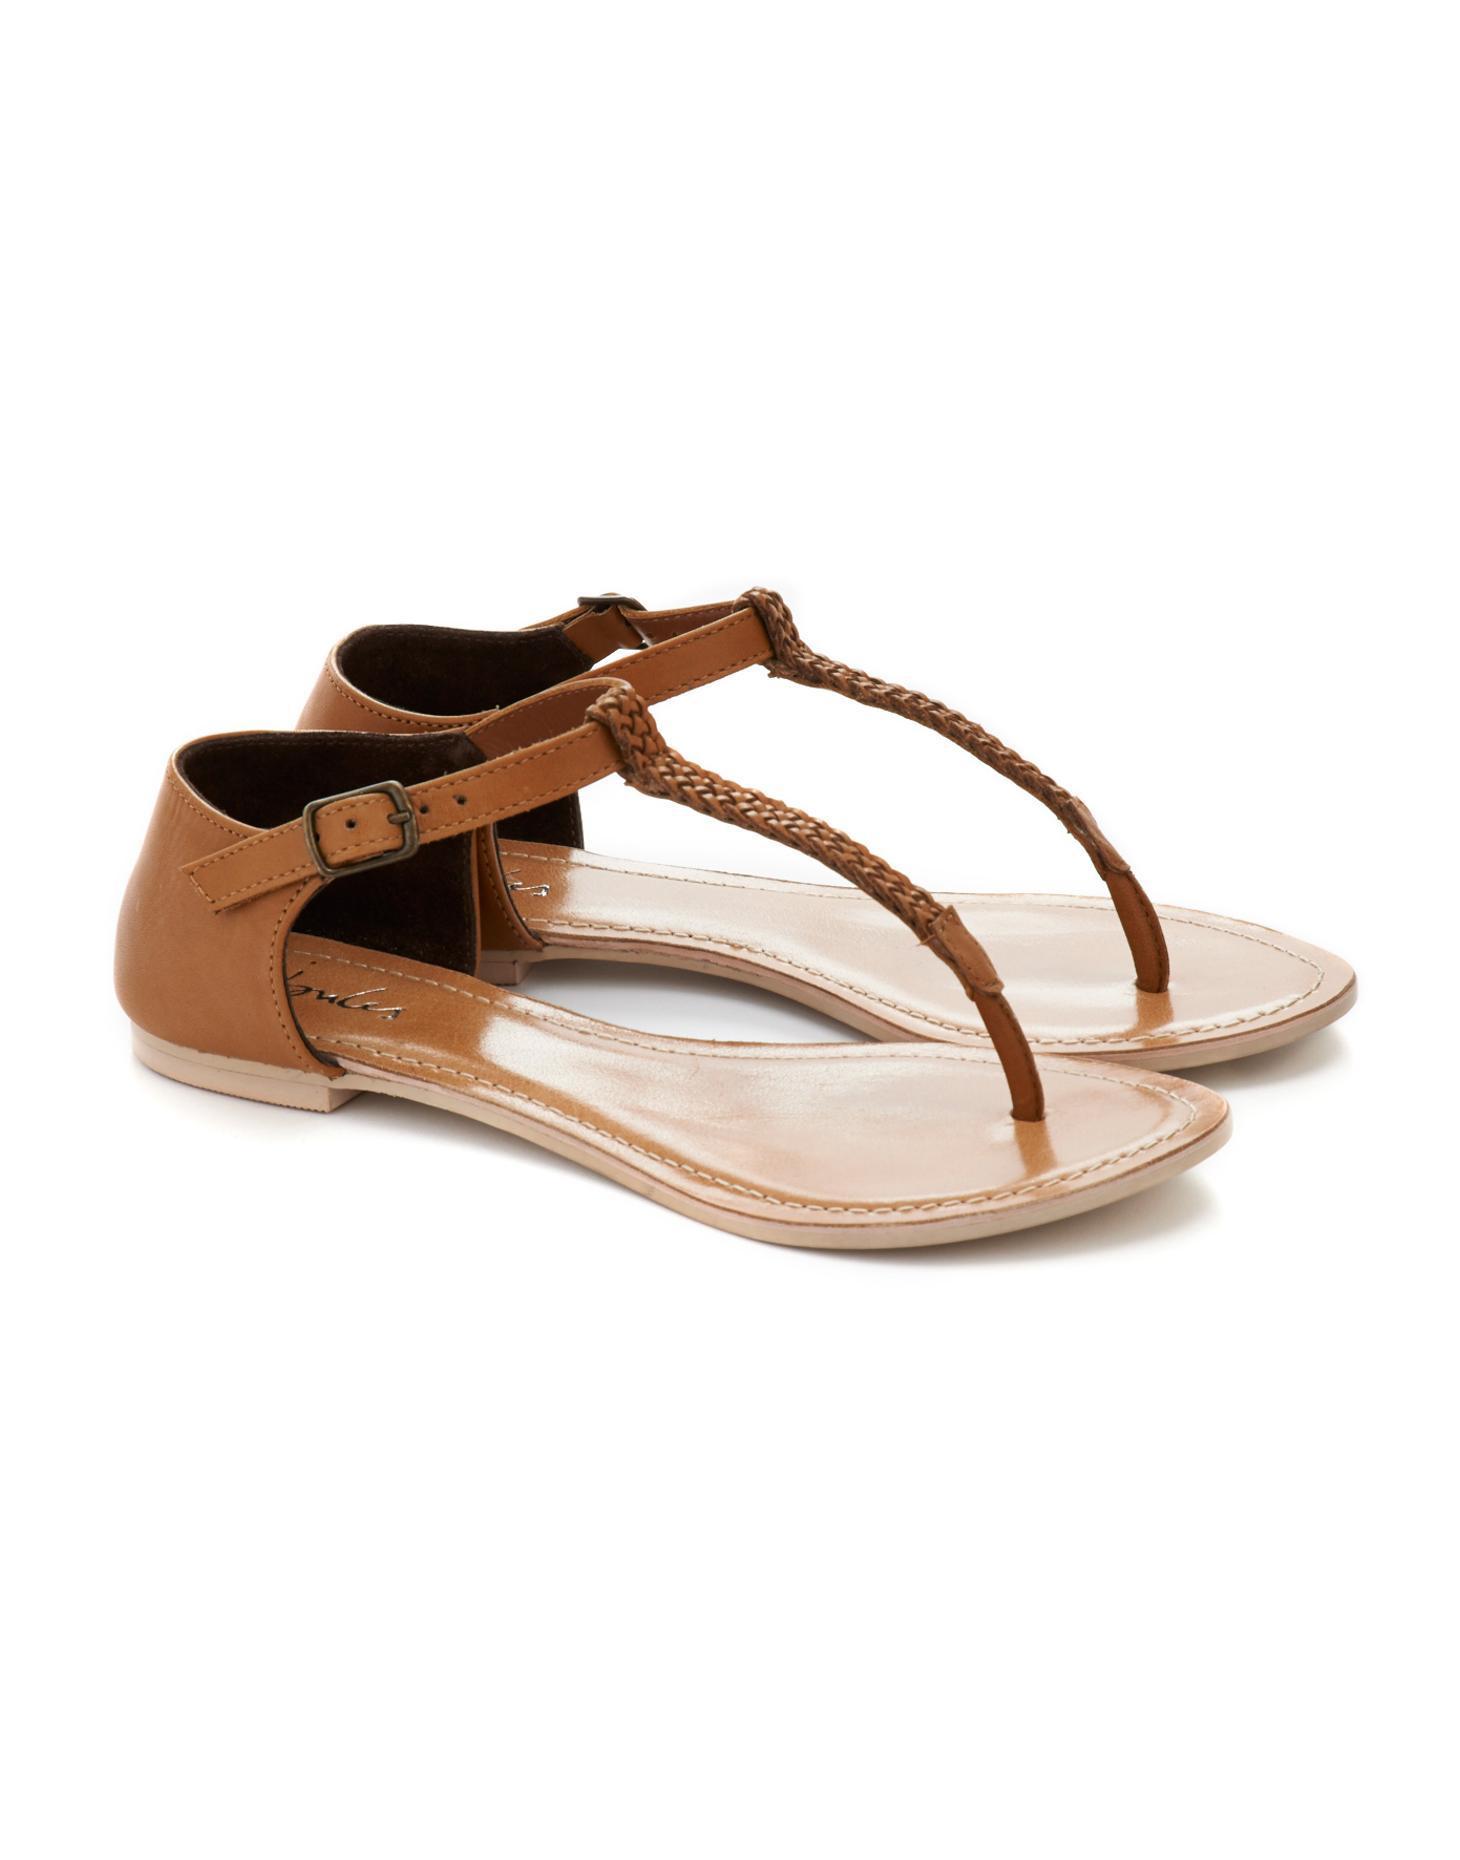 Tan Livvie Womens Sandal  | Joules US